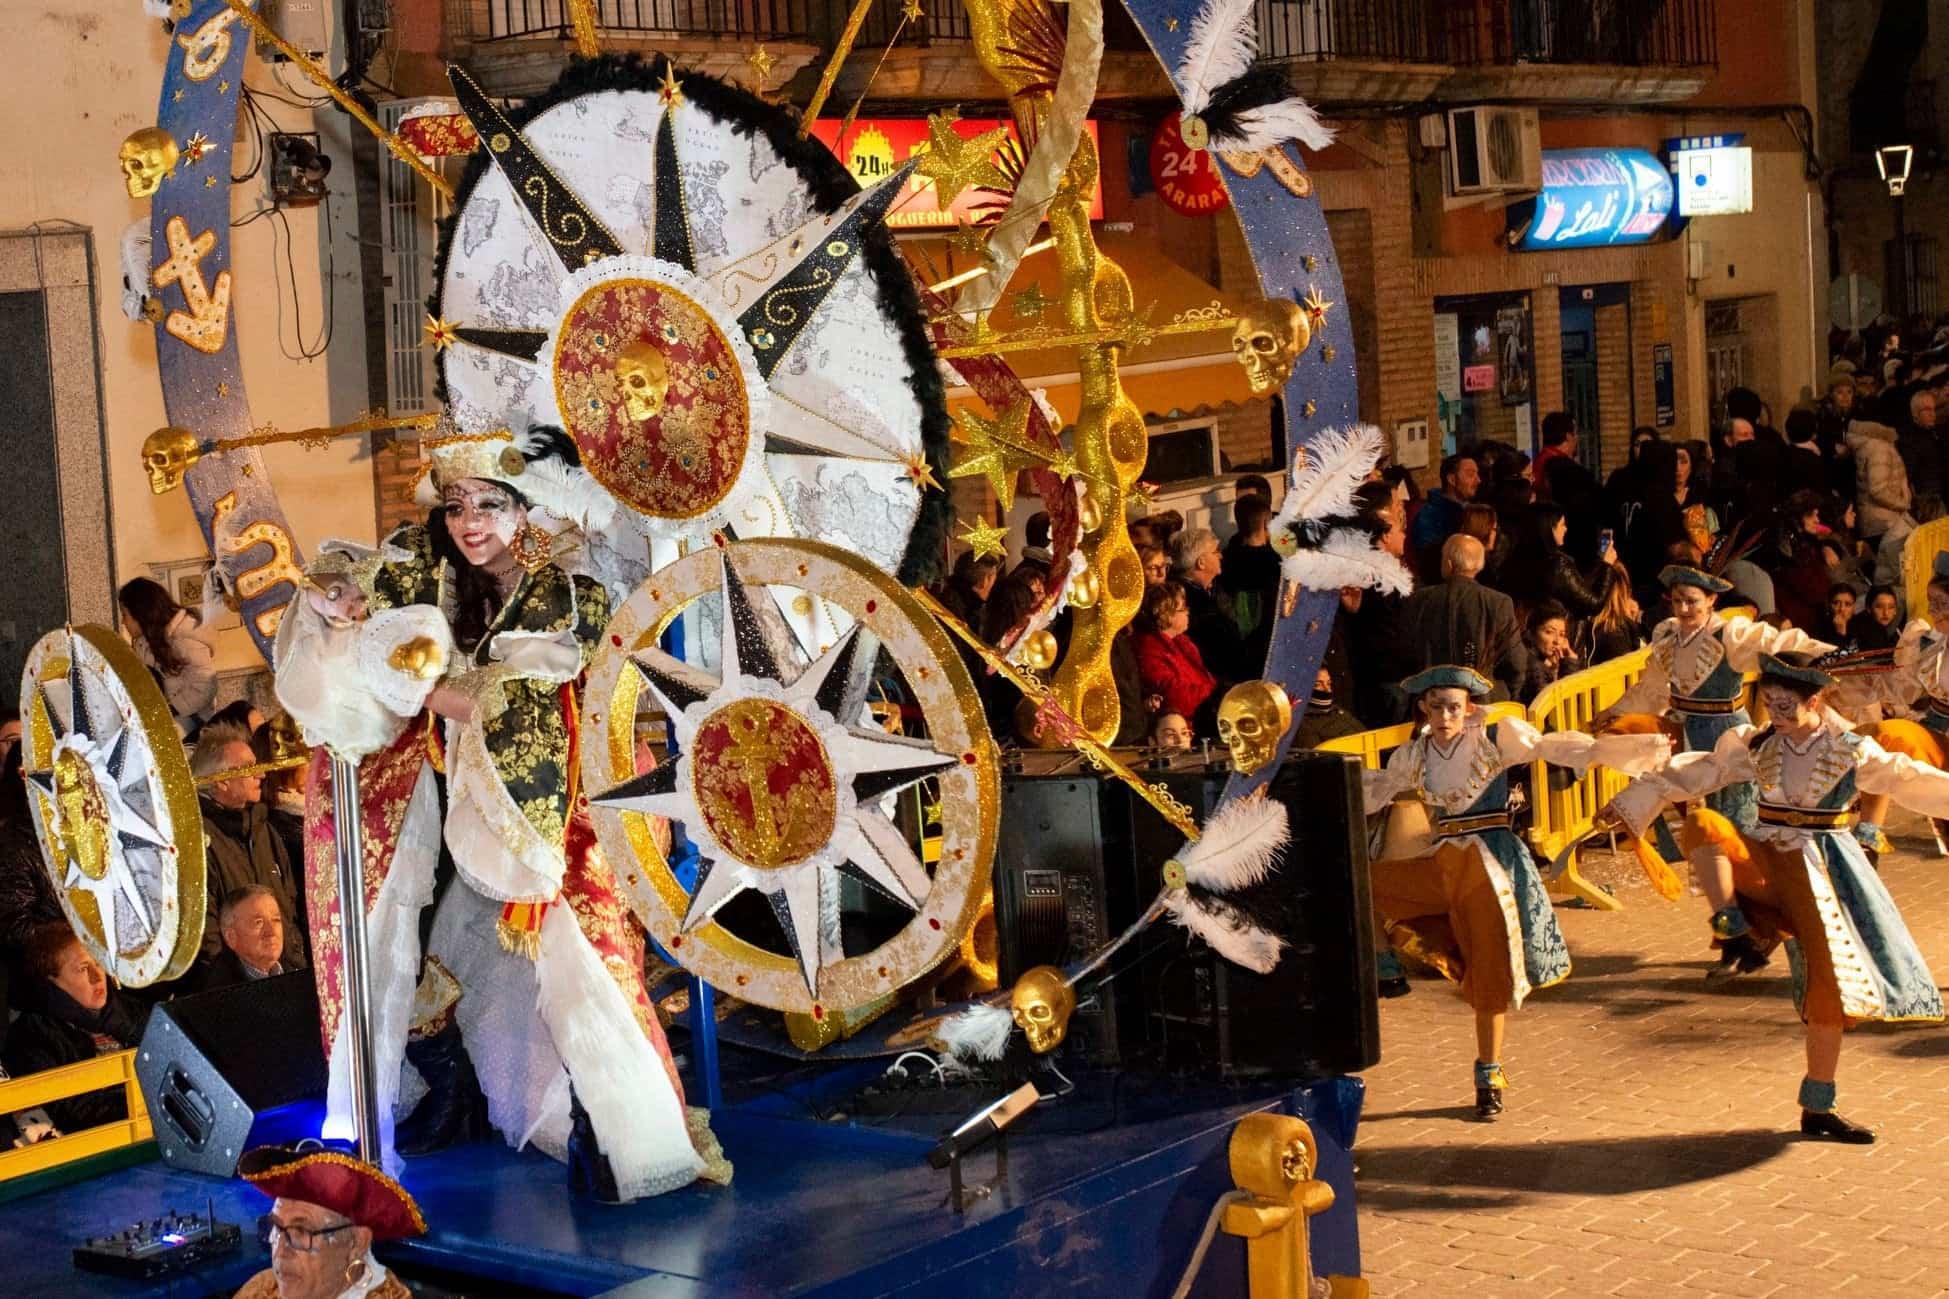 Carnaval de herencia 2020 ofertorio 16 - Selección de fotografías del Ofertorio del Carnaval de Herencia